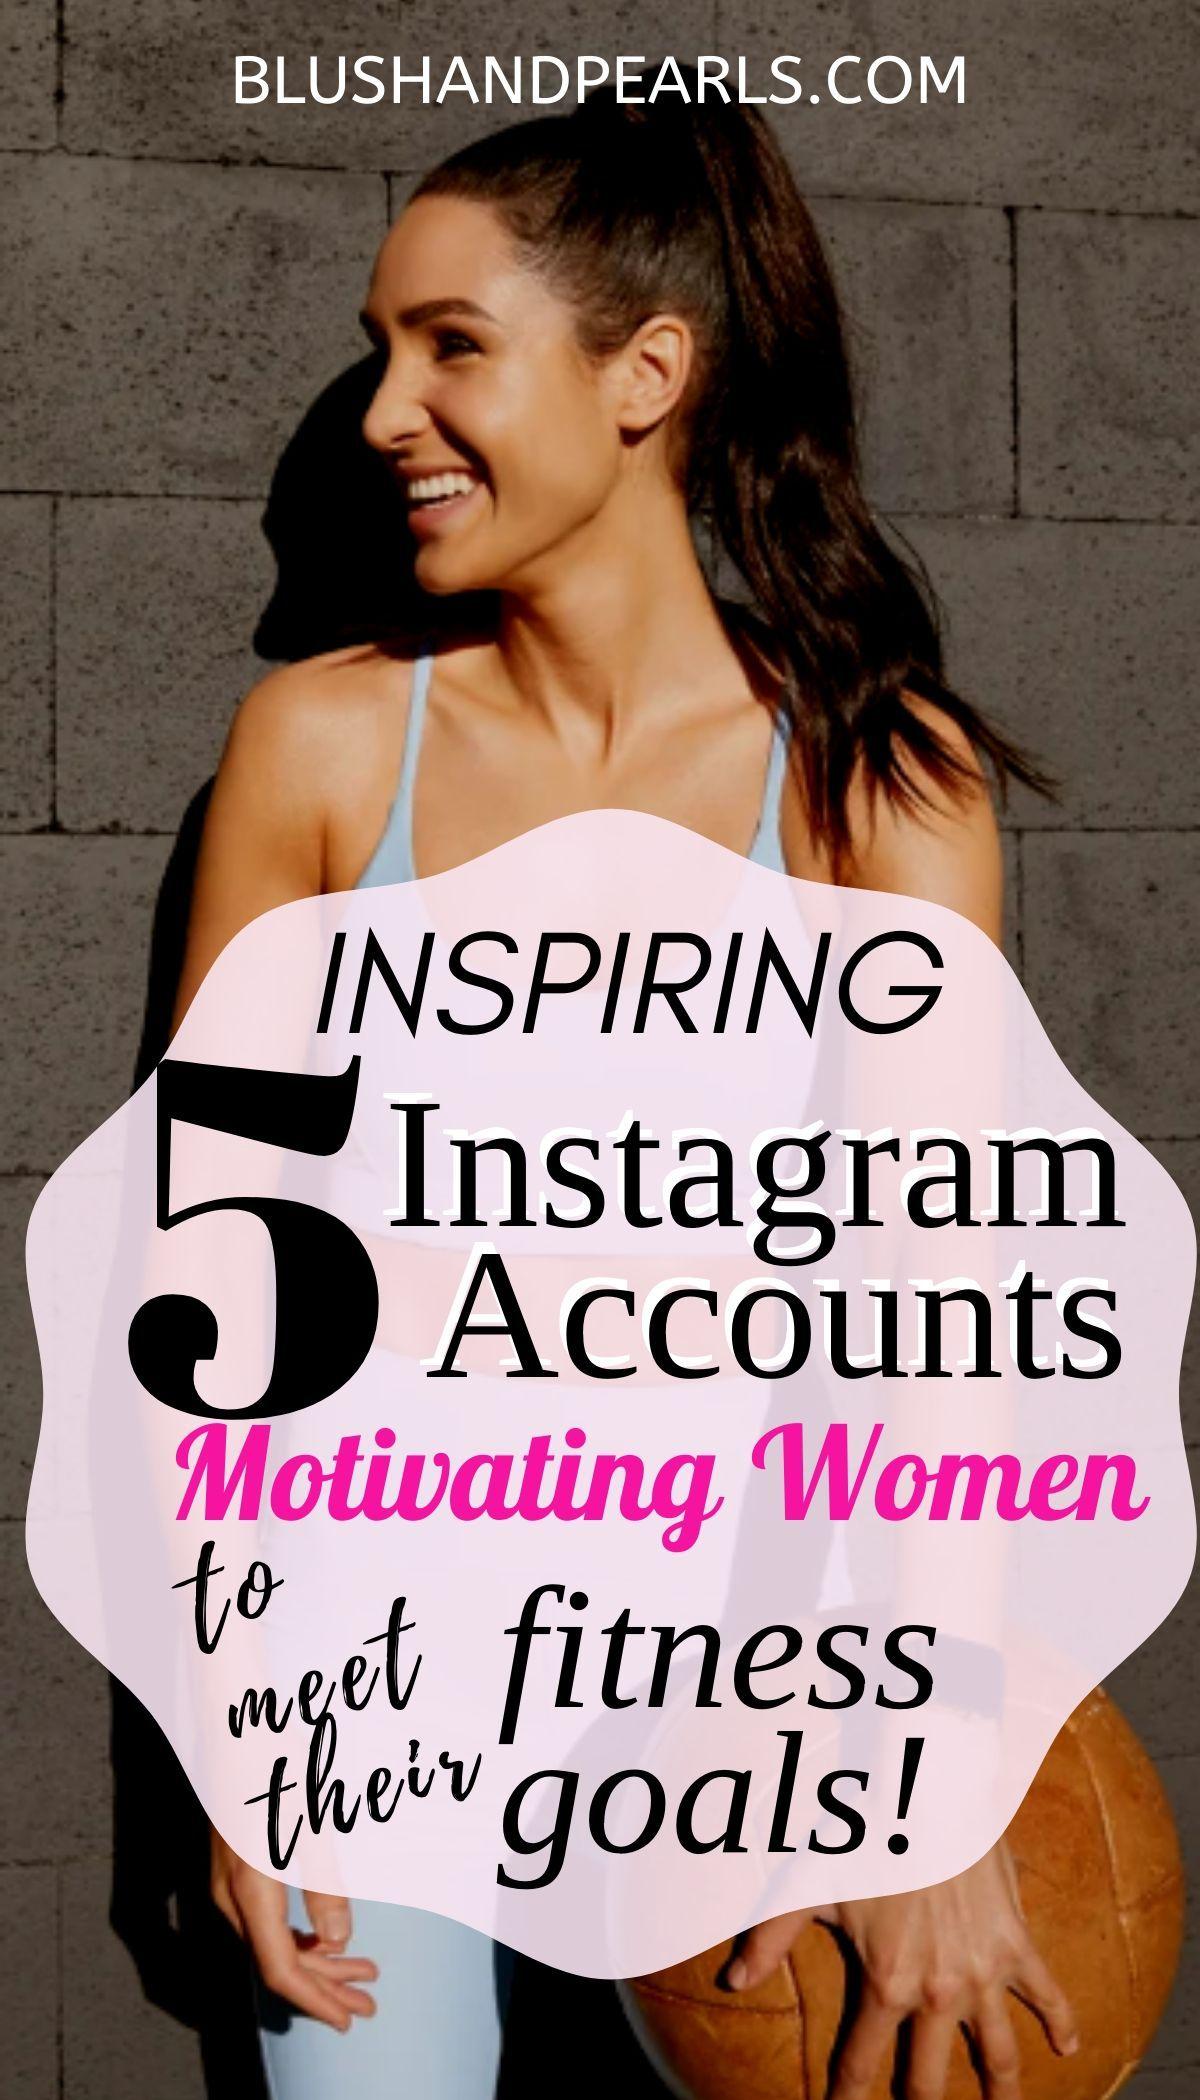 5 Empowering Instagram Accounts Helping Women Reach Their